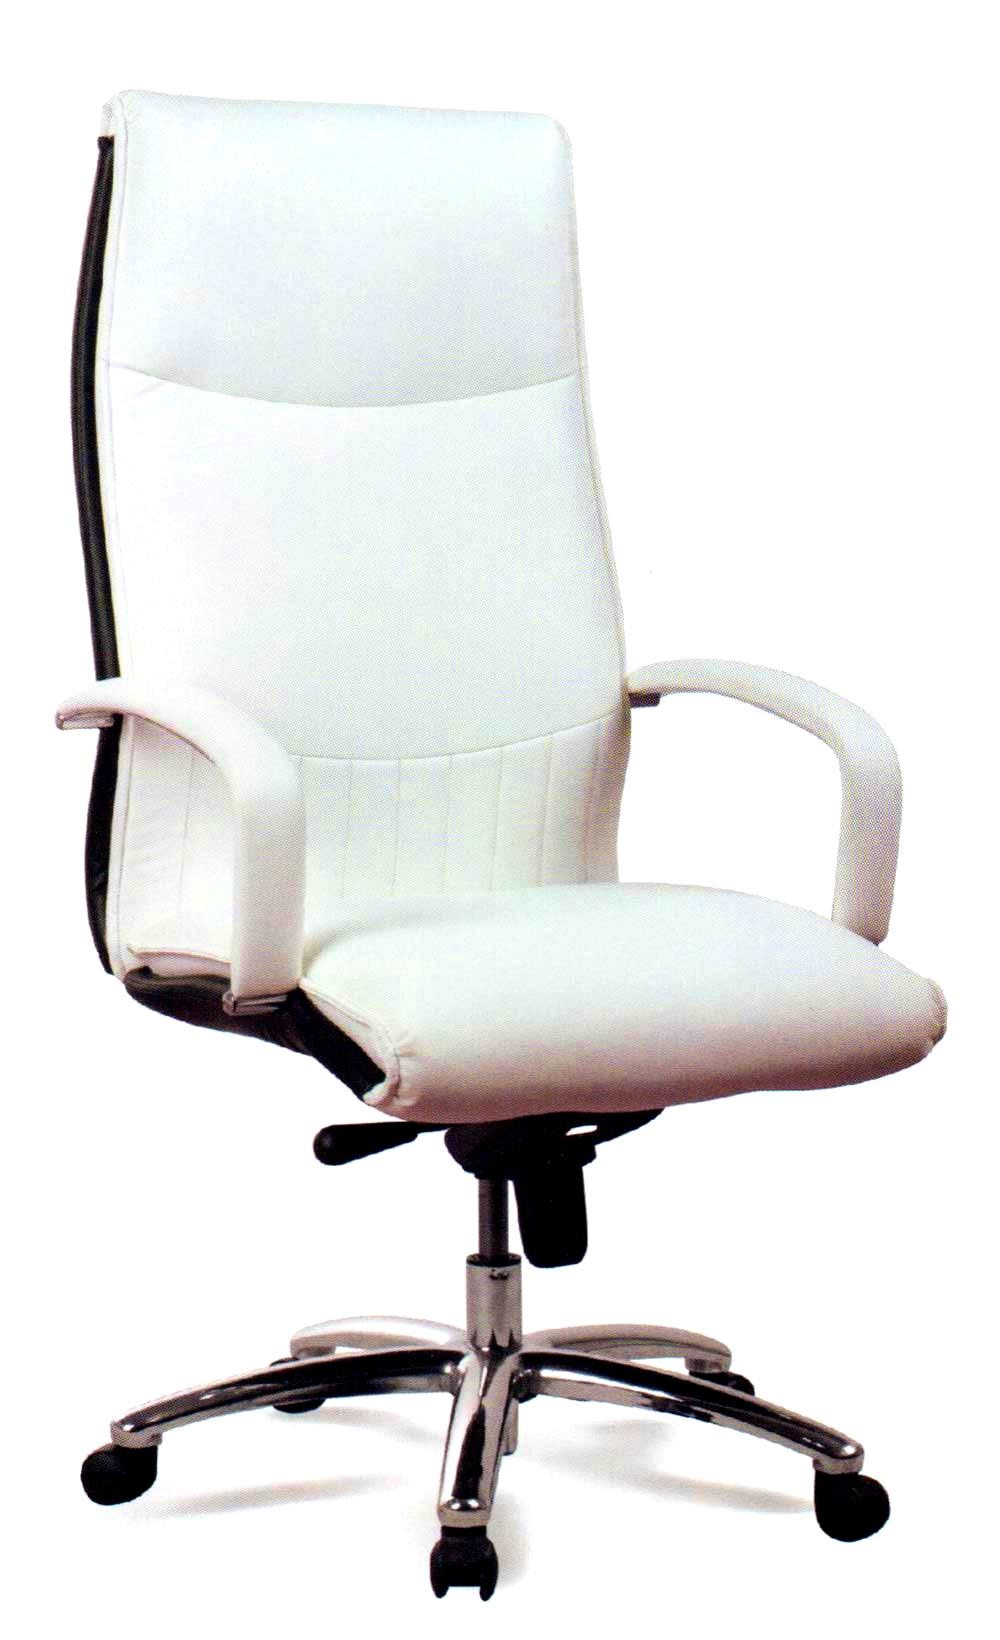 Target Desk Chair bangkokfoodietourcom